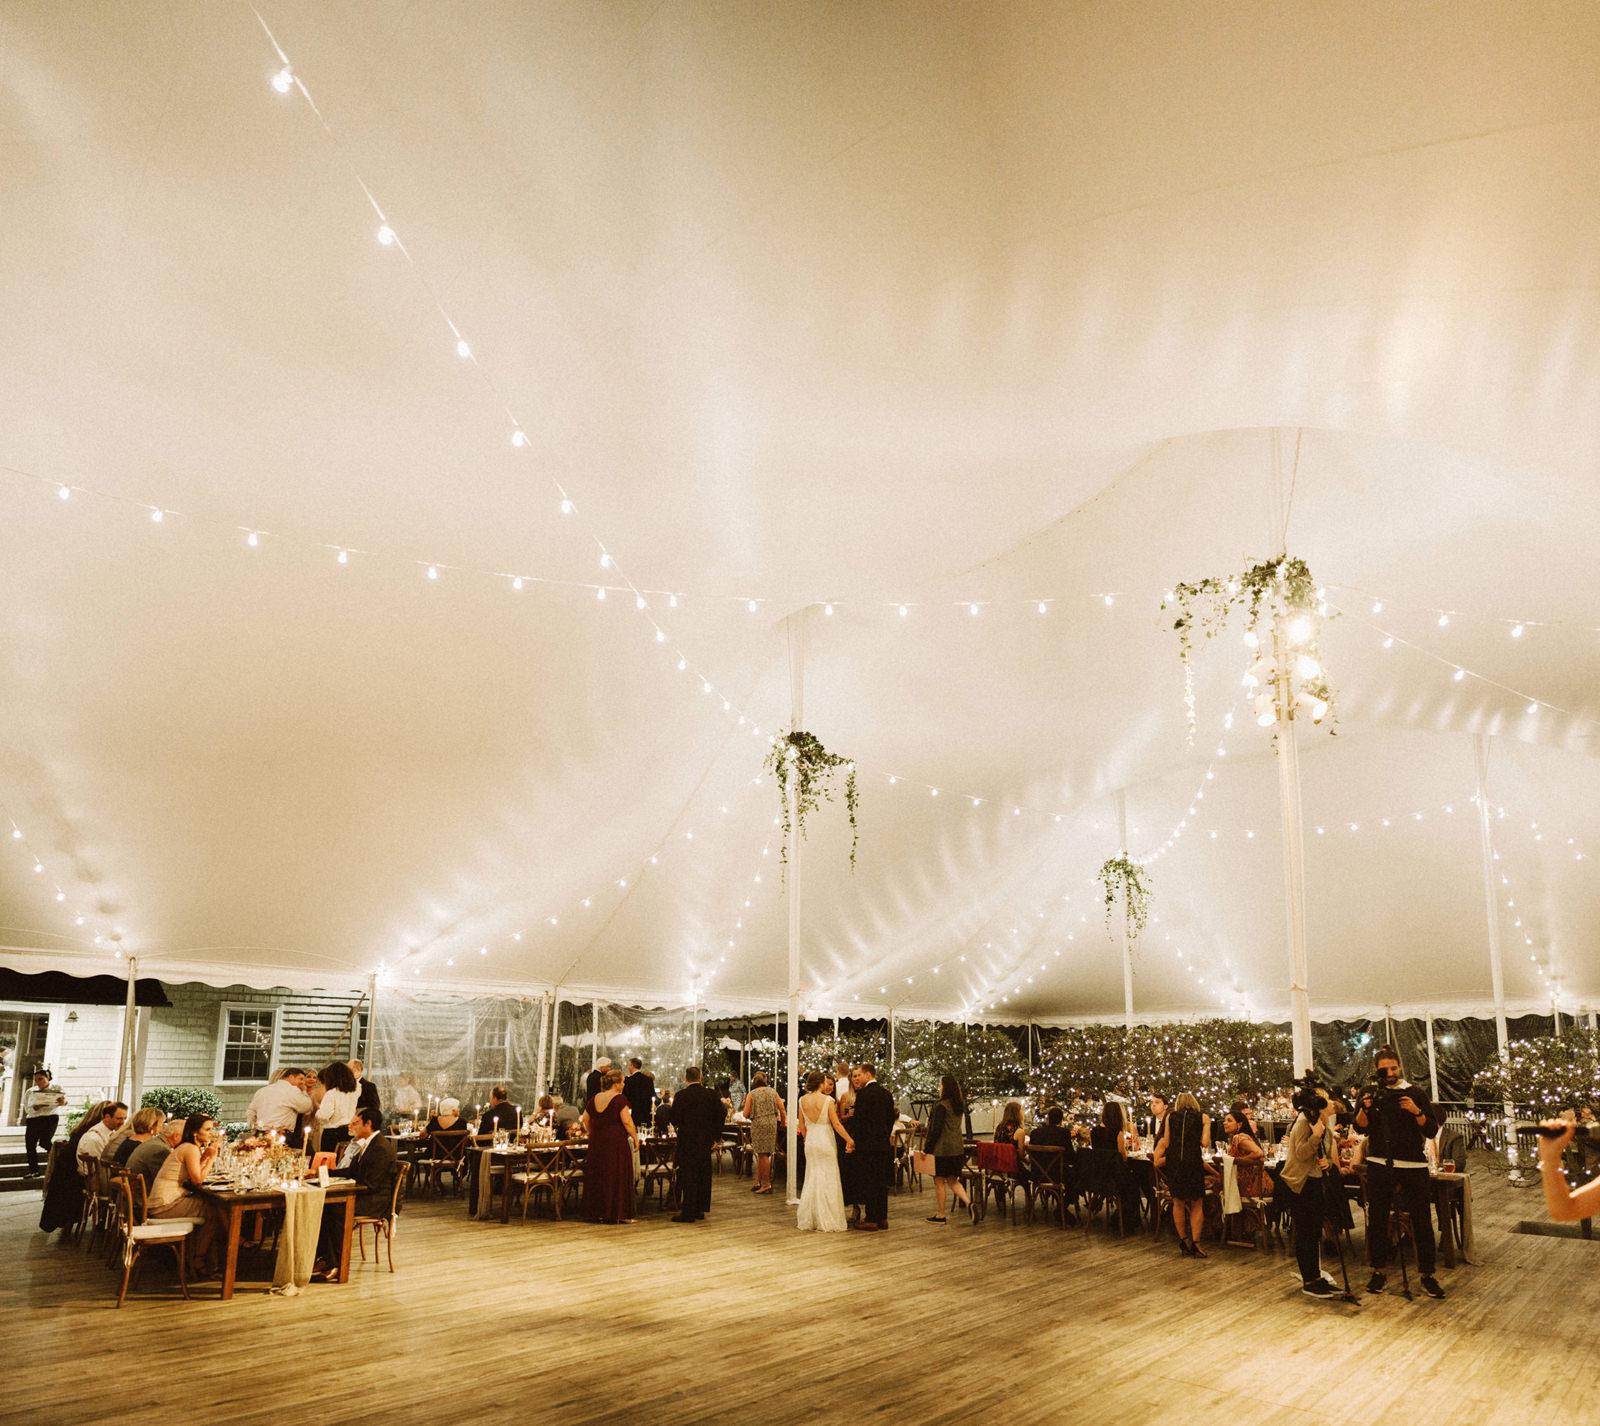 bridgeport-wedding-147 BRIDGEPORT, CONNECTICUT BACKYARD WEDDING